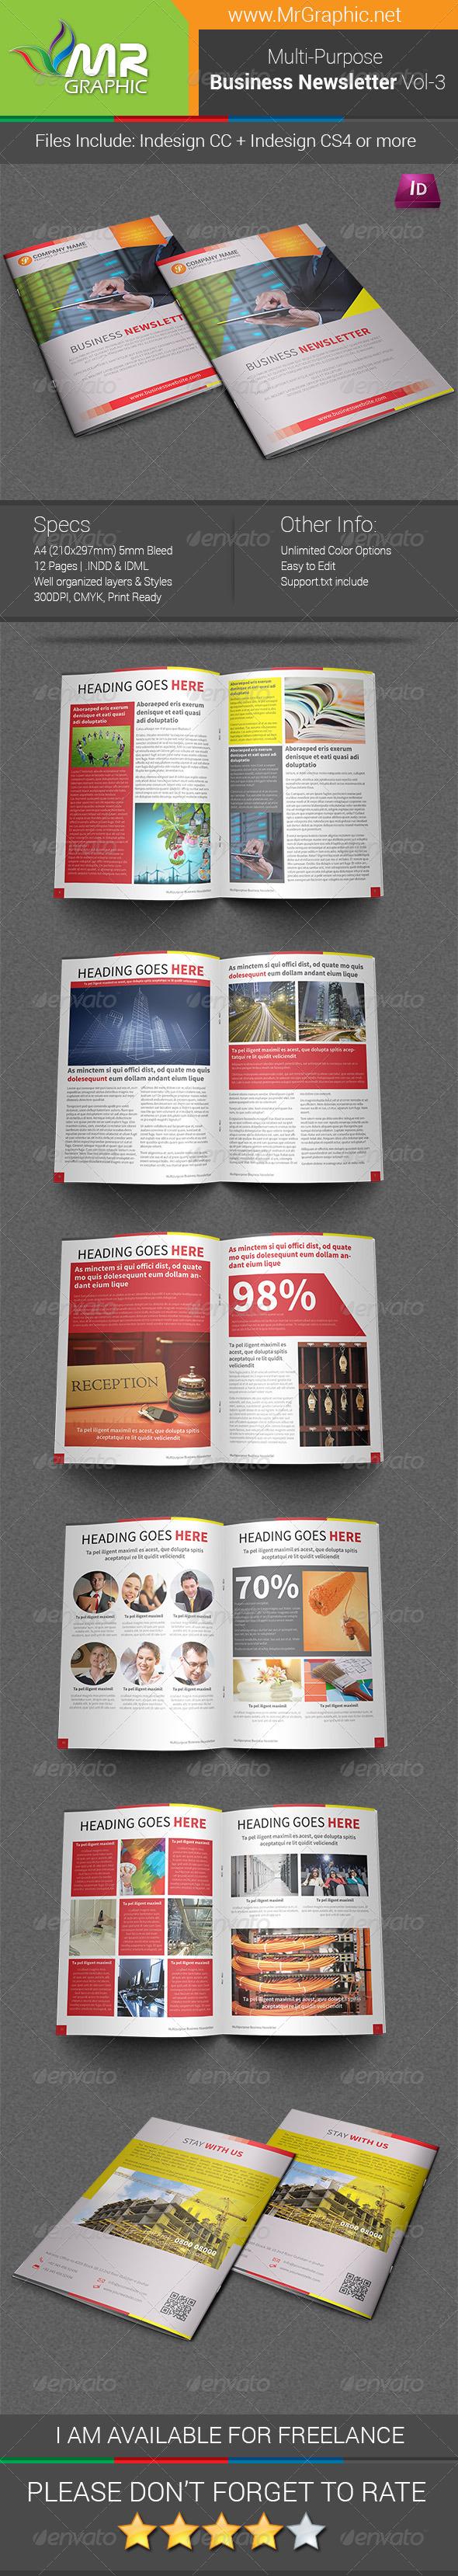 GraphicRiver Multipurpose Business Newsletter Template Vol-03 7327816